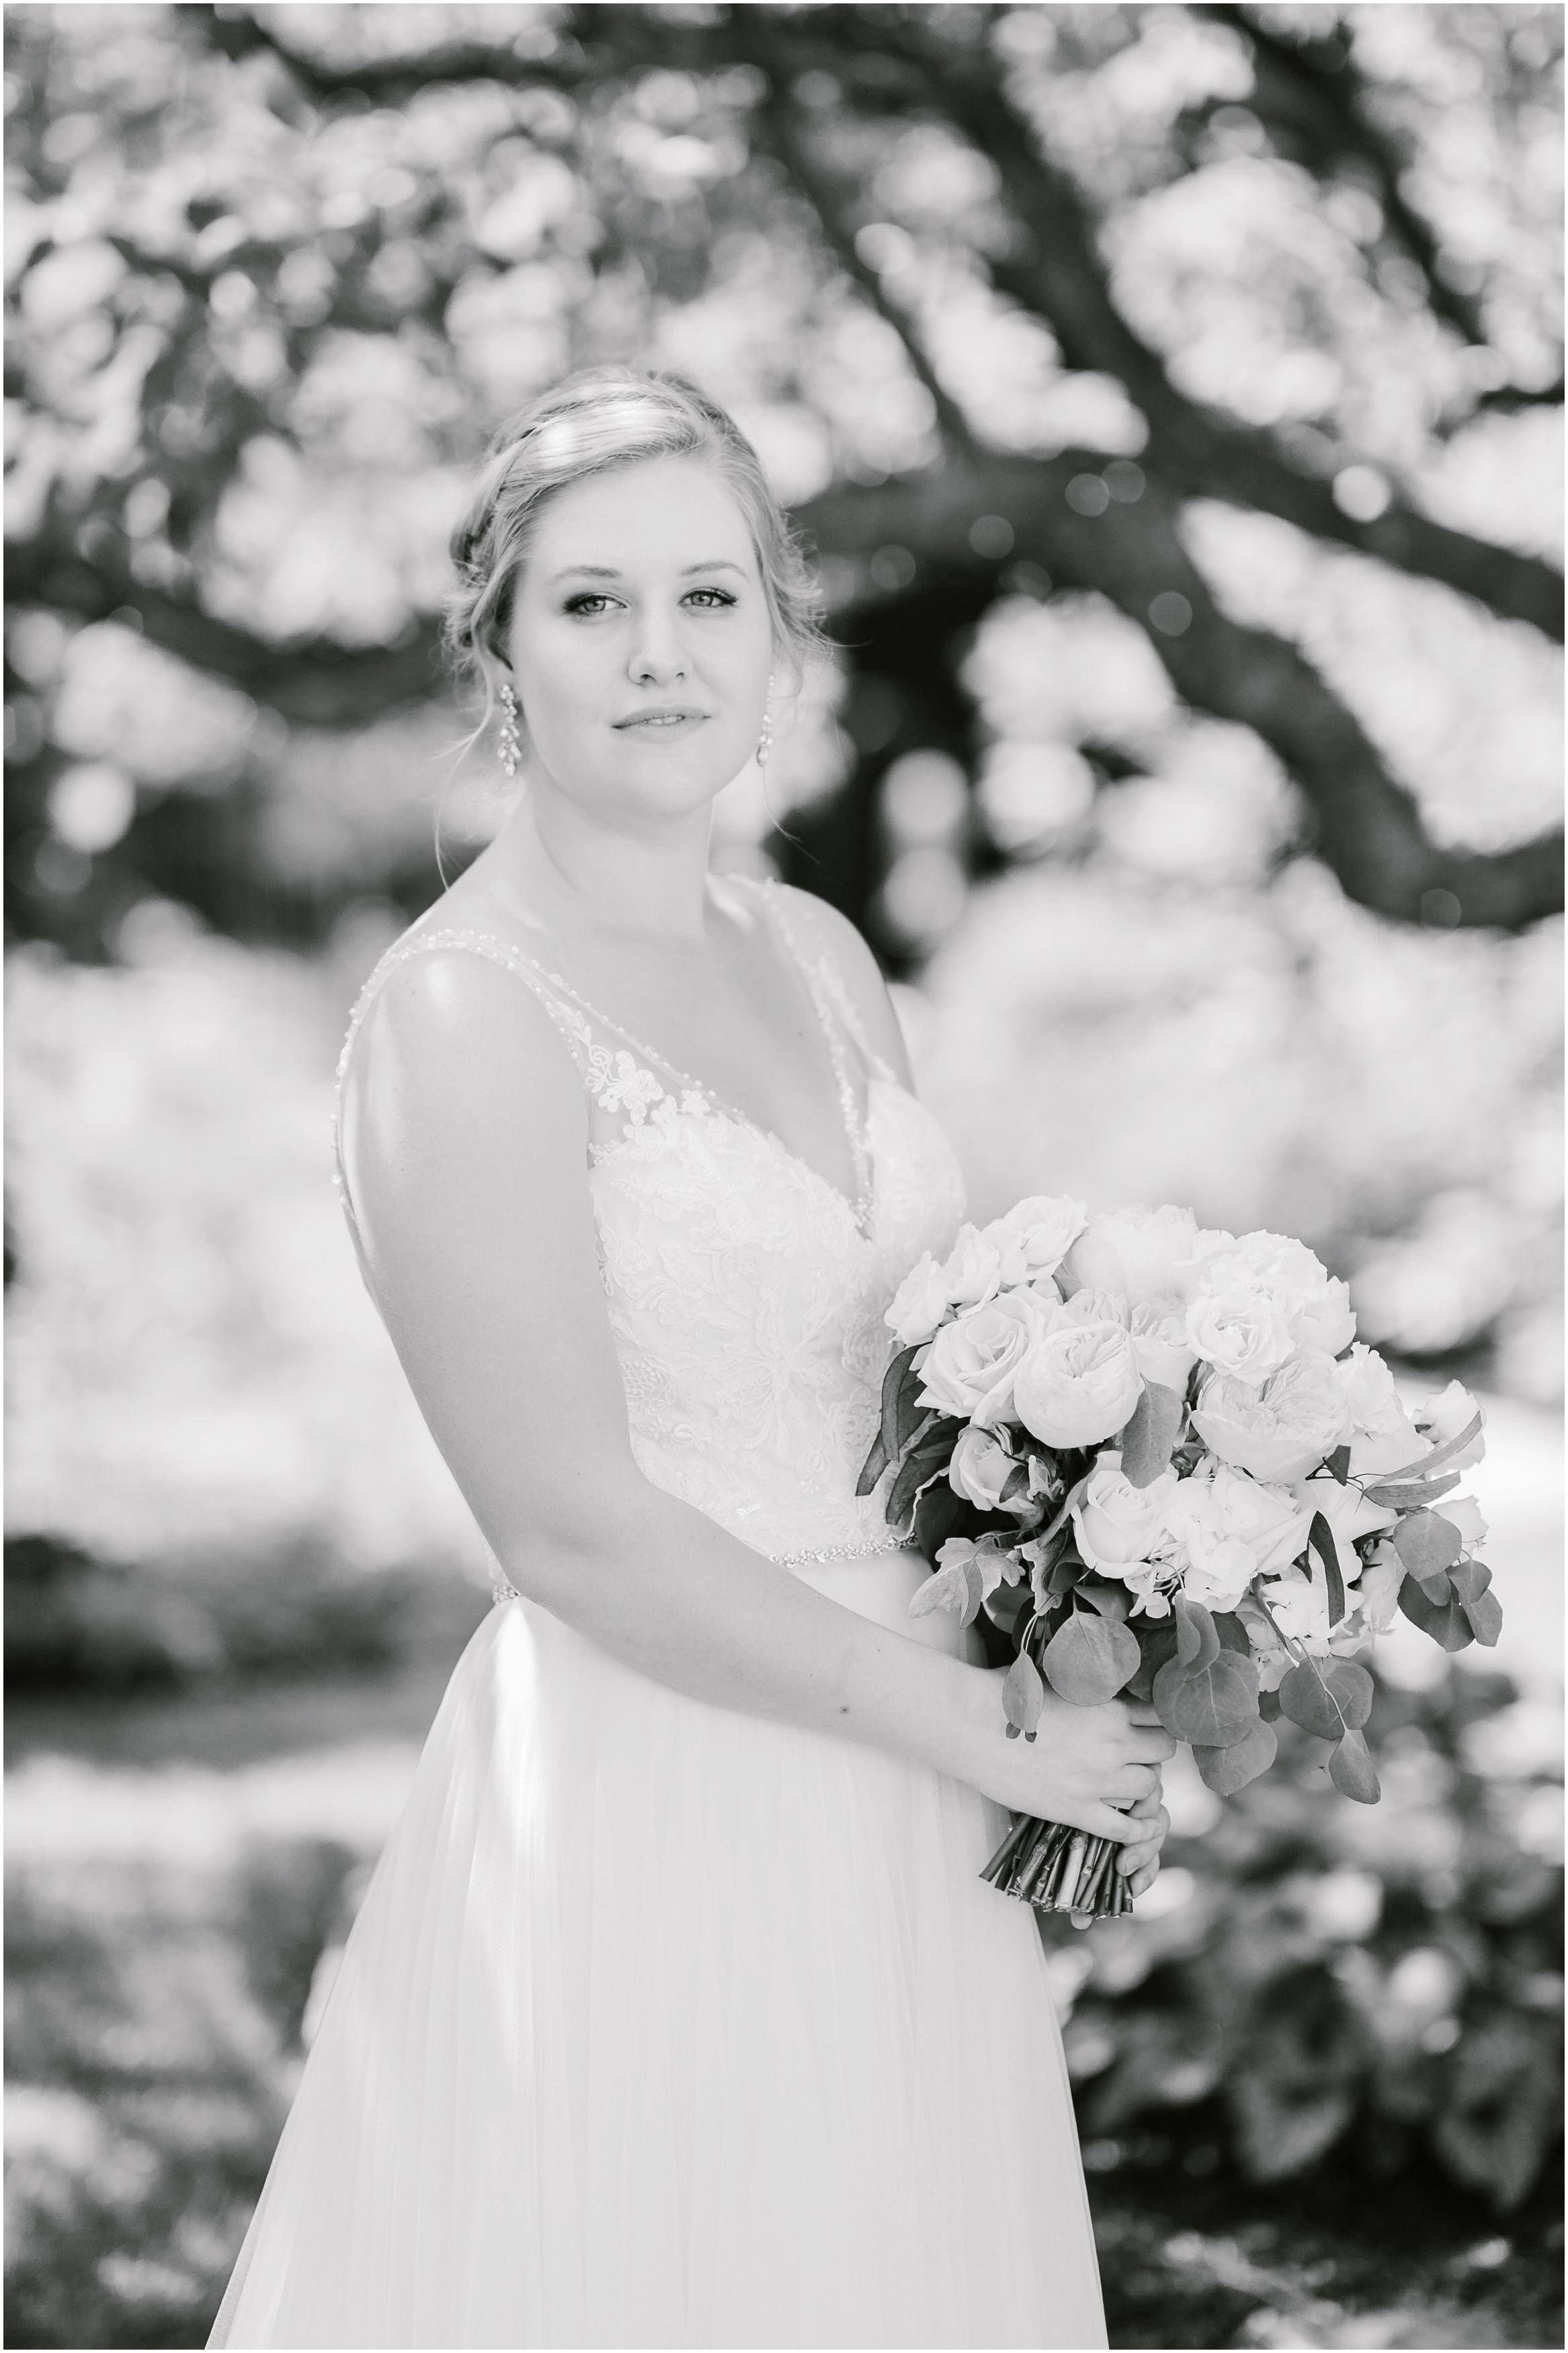 Rebecca_Shehorn_Photography_Indianapolis_Wedding_Photographer_8499.jpg